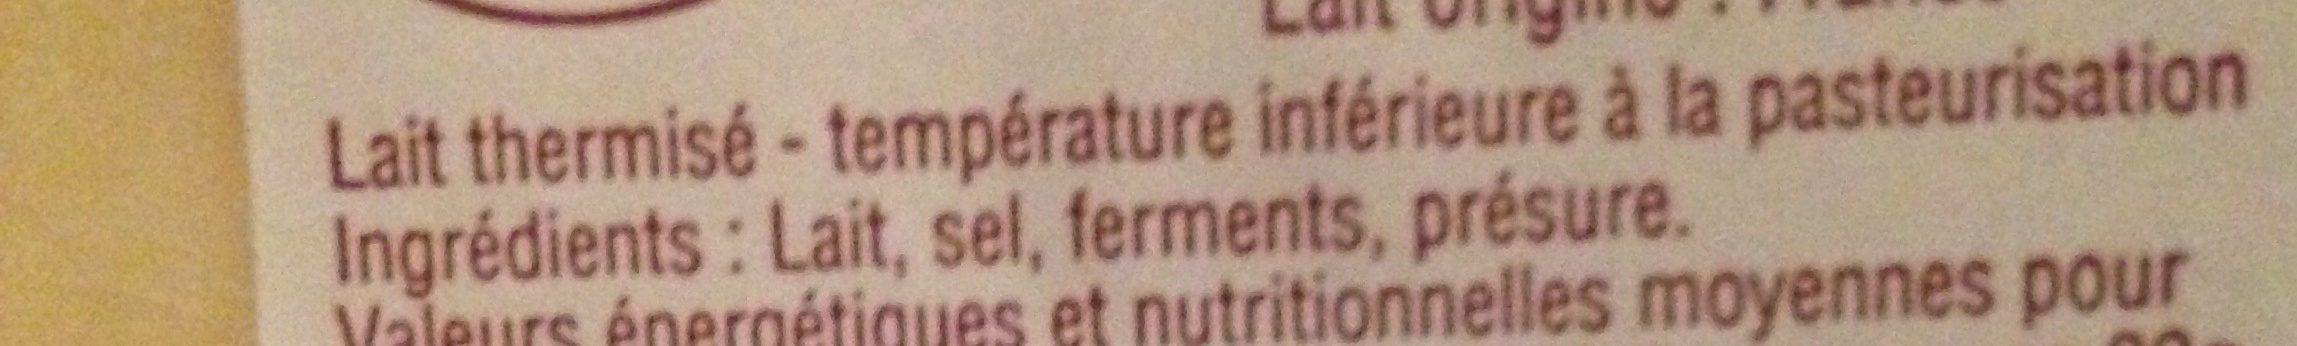 Tomme de Savoie - Ingredients - fr